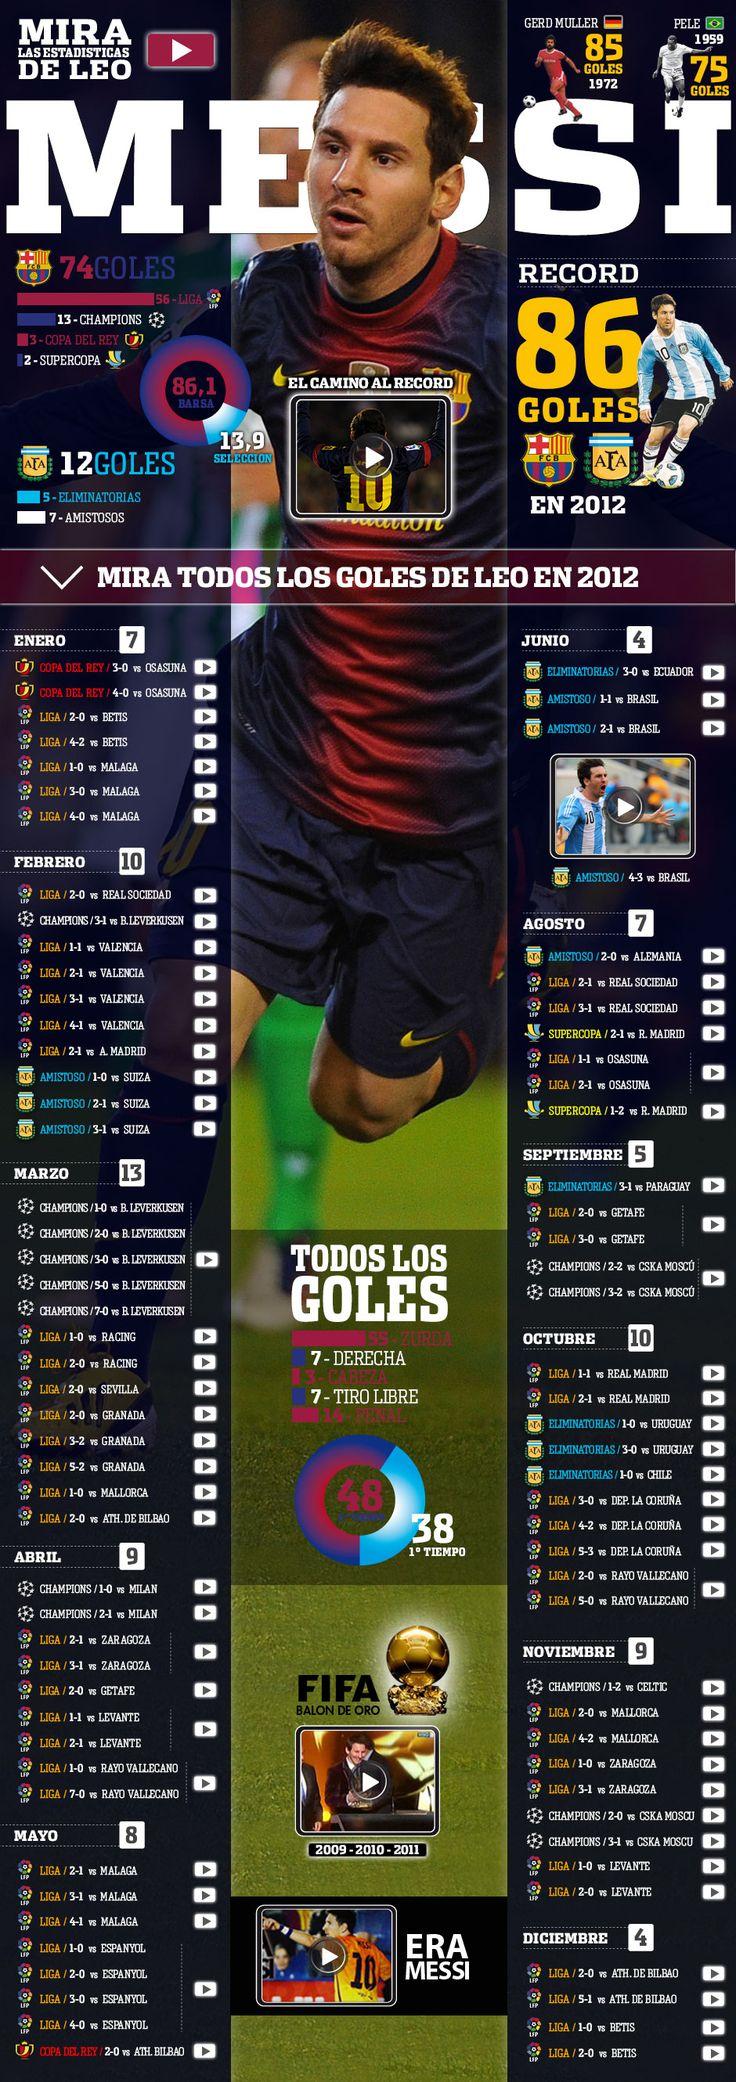 Messi record 2012 - | Olé